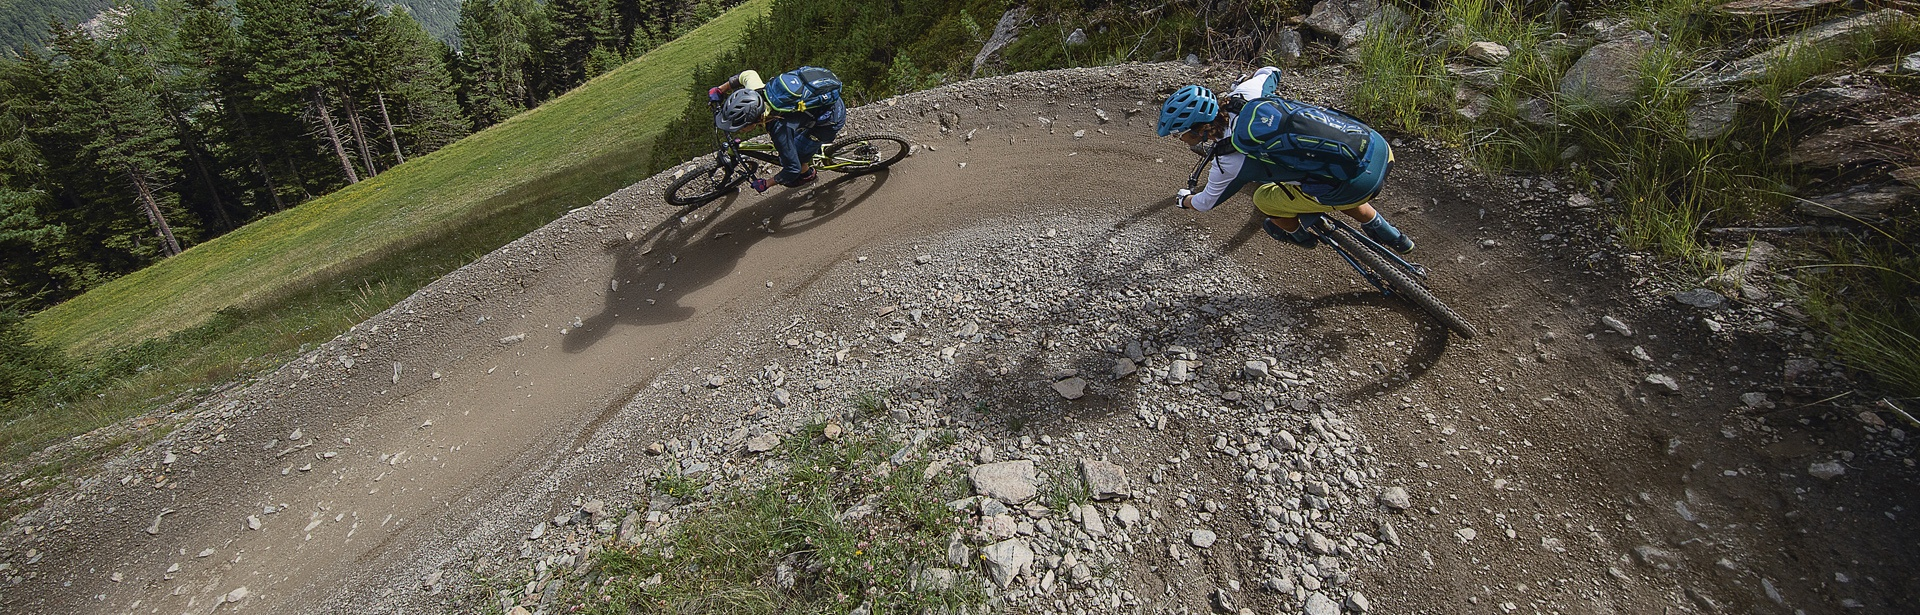 BikeAttackSideShot3RBG-1